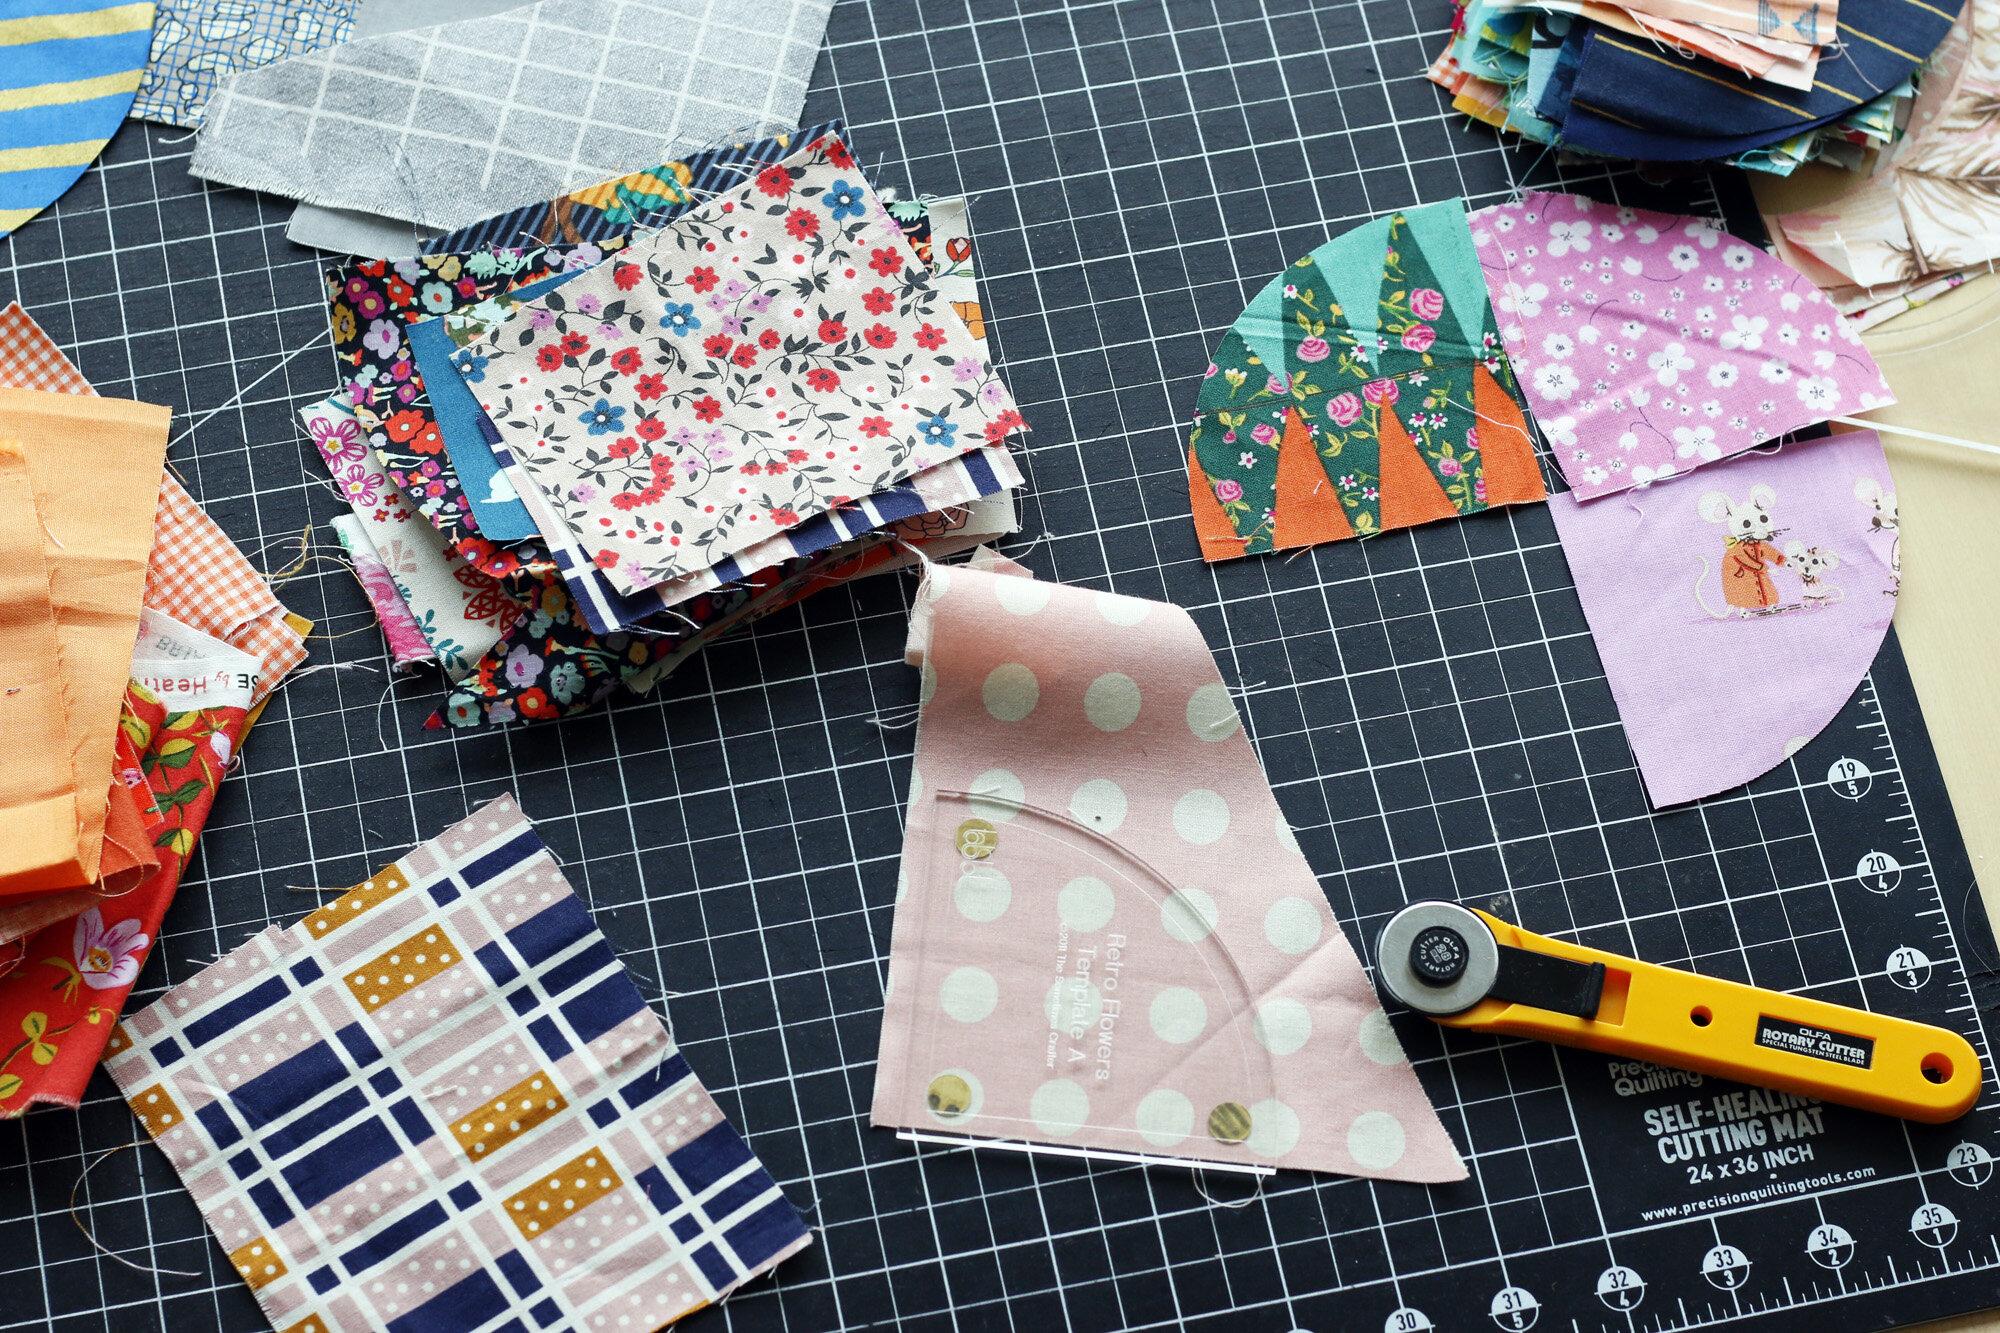 Cutting Dear Dottie. Stitched in Color.jpg